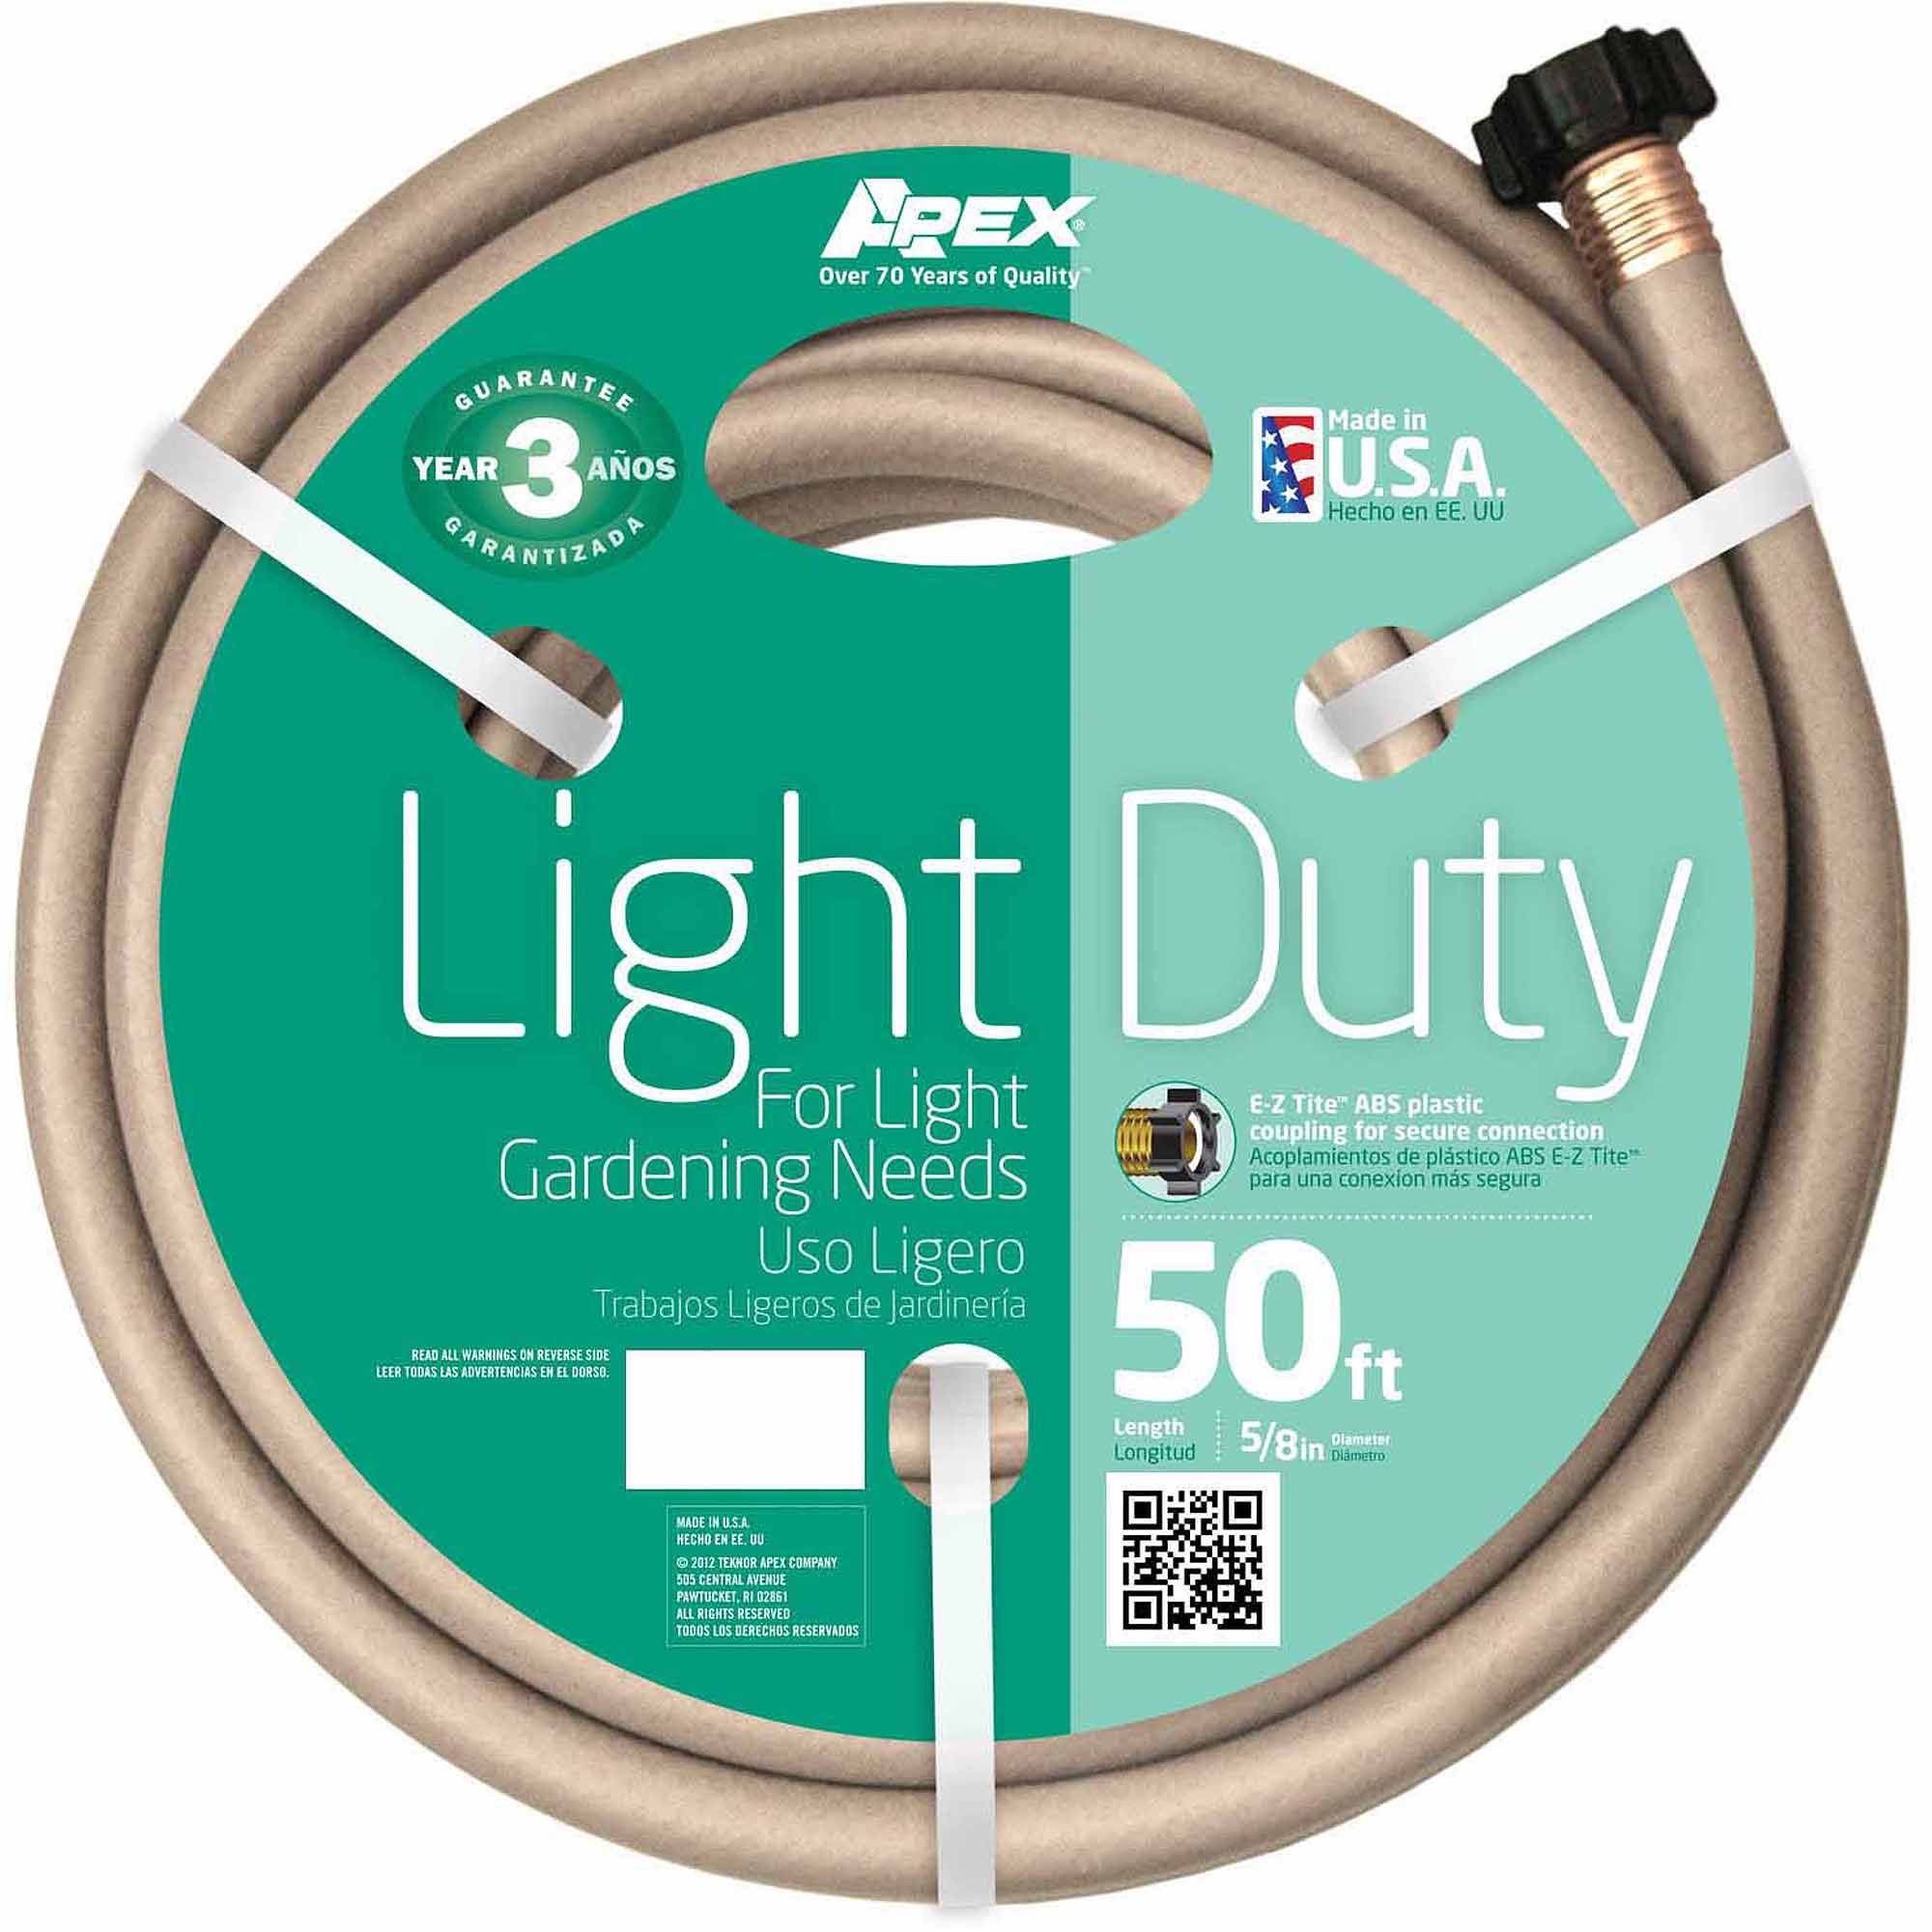 "Teknor Apex 8400-50 5/8"" x 50' Light Duty Garden Hose"